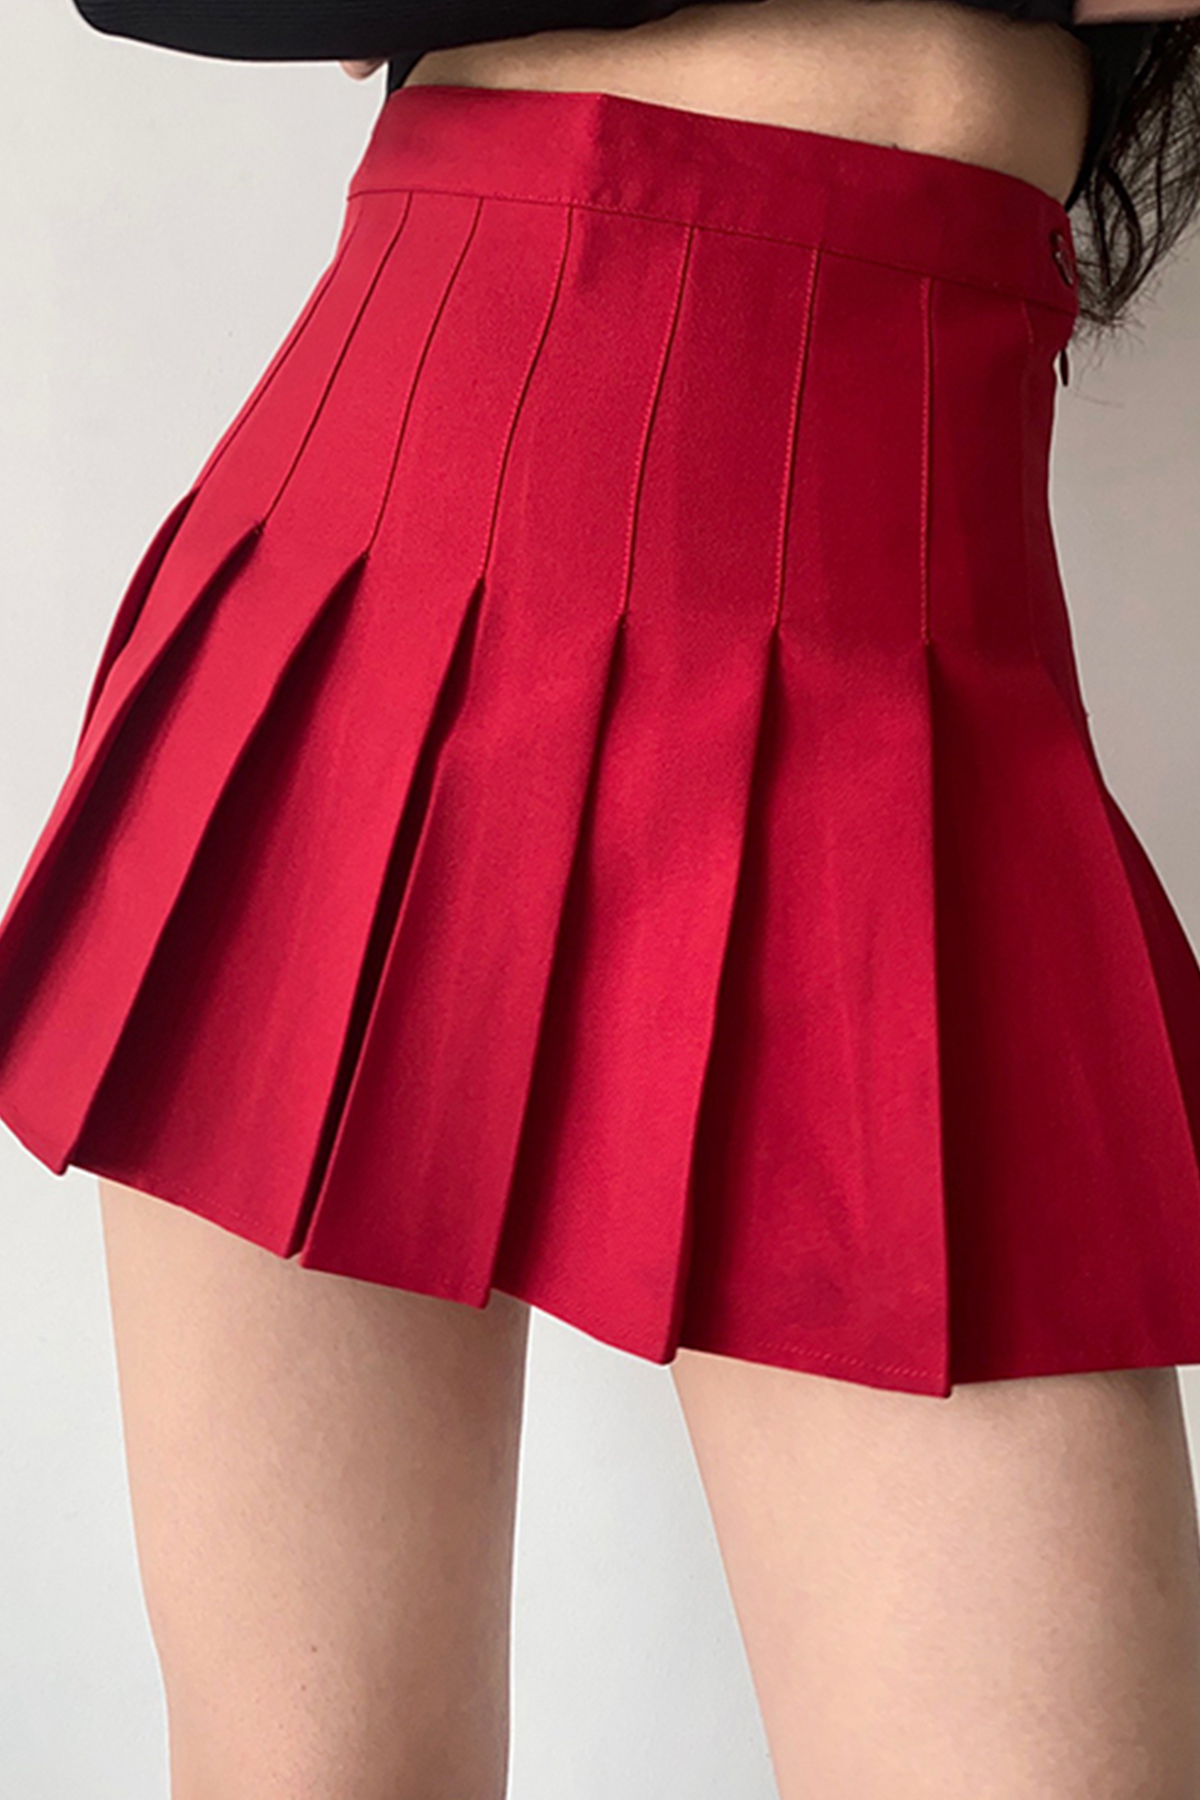 THE MOODSS Elspeth Skirt-8